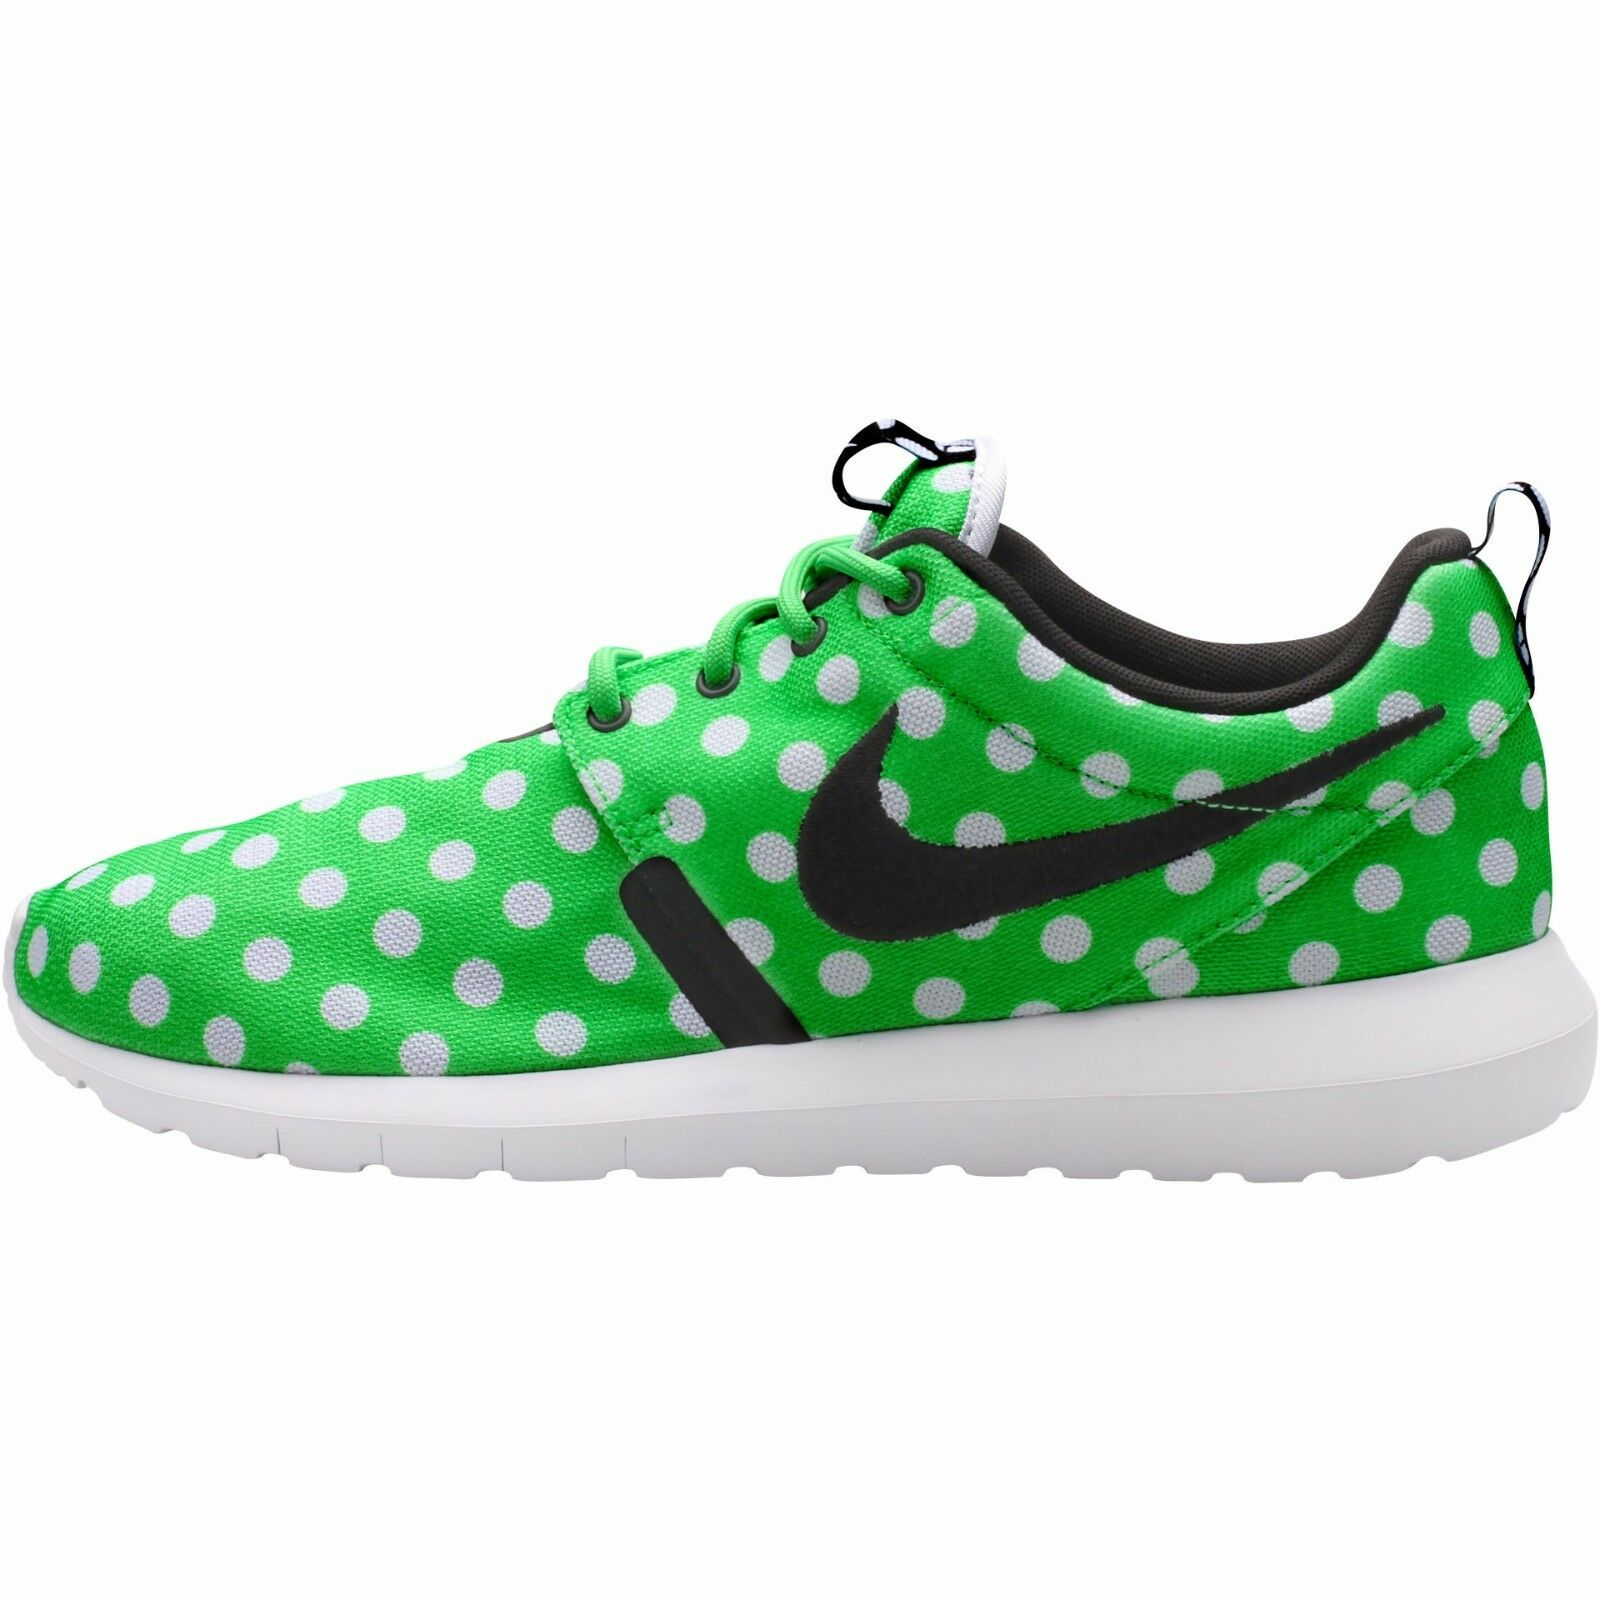 Nike Roshe NM QS Mens shoes Green Strike Black White Polka Dot 810857 300